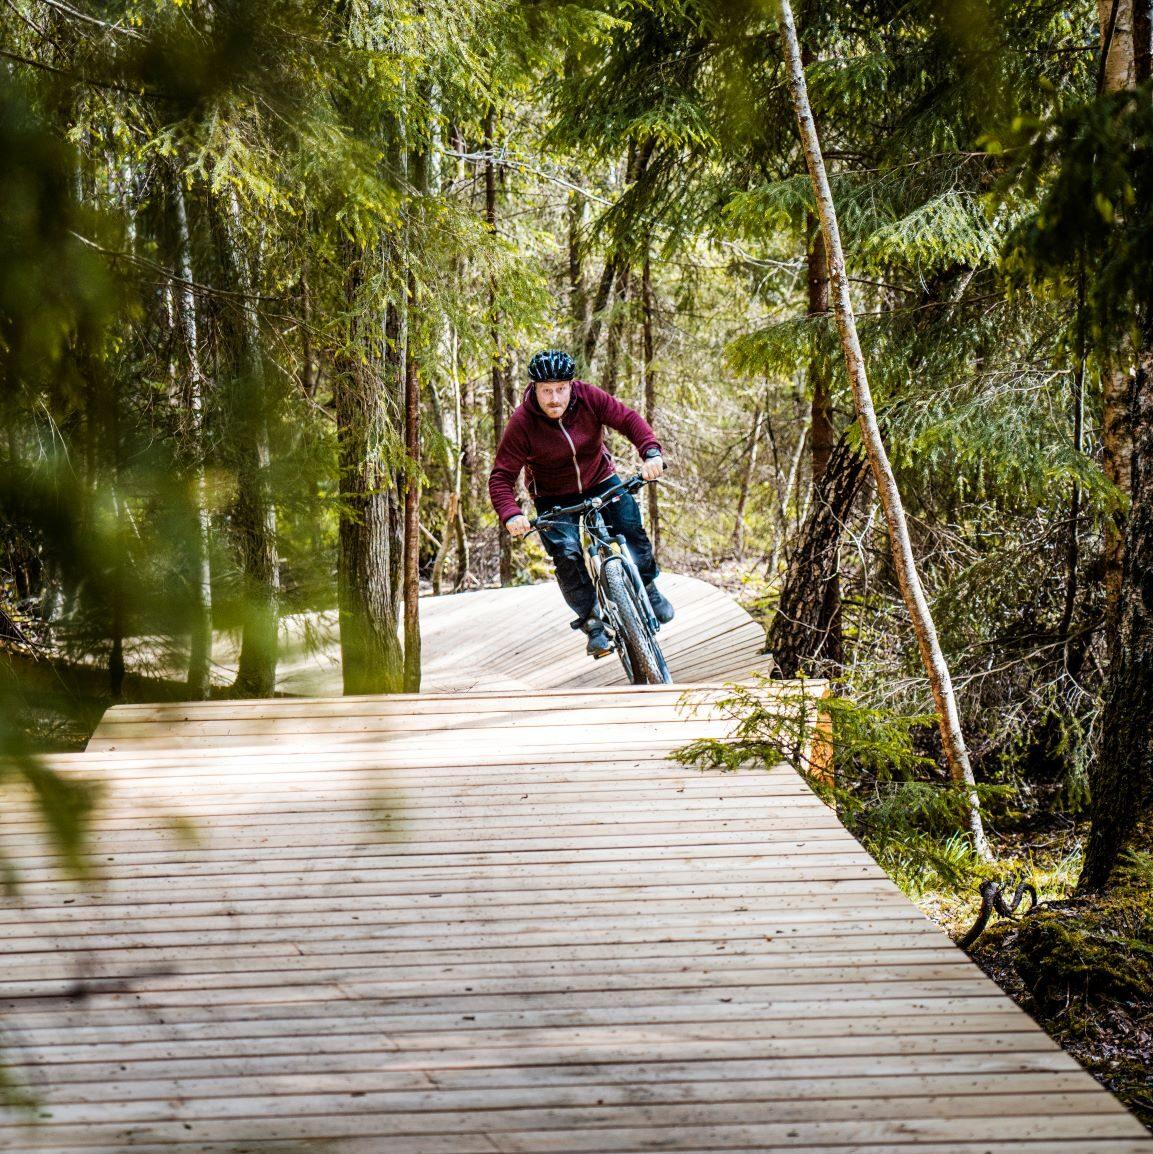 mountainbikecyklist på träbro i skogen